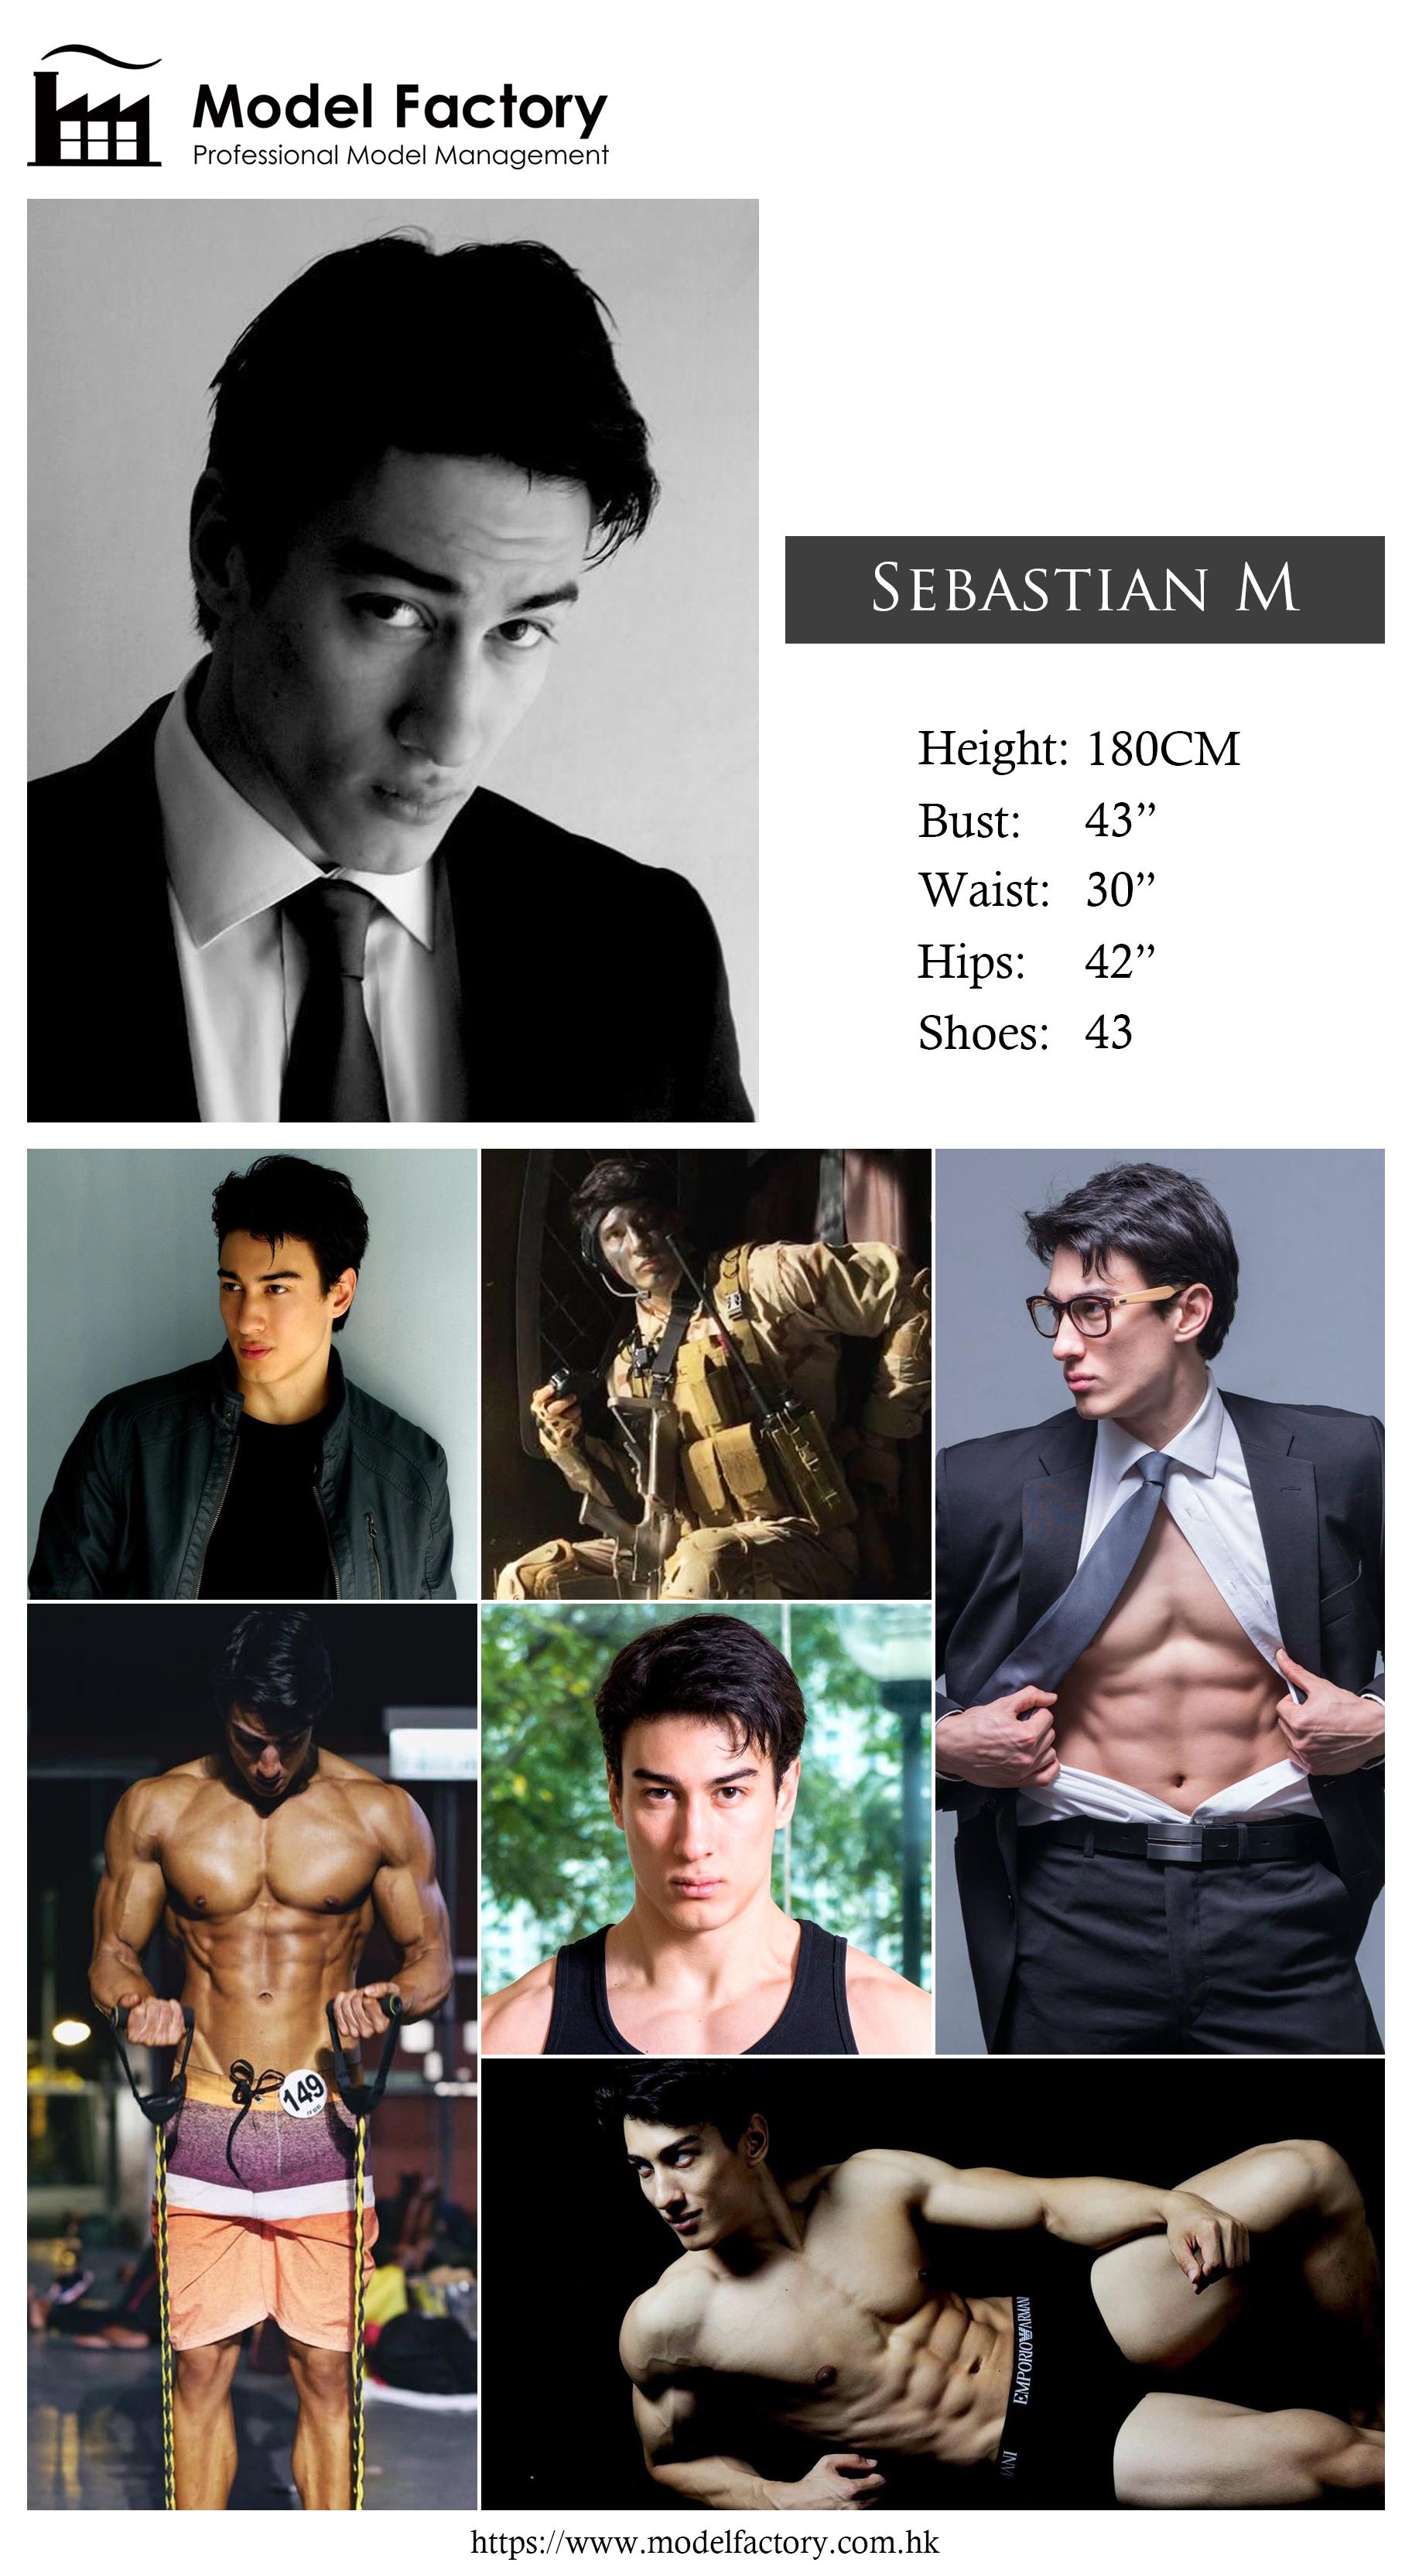 Model Factory Caucasian Male Model SebastianM